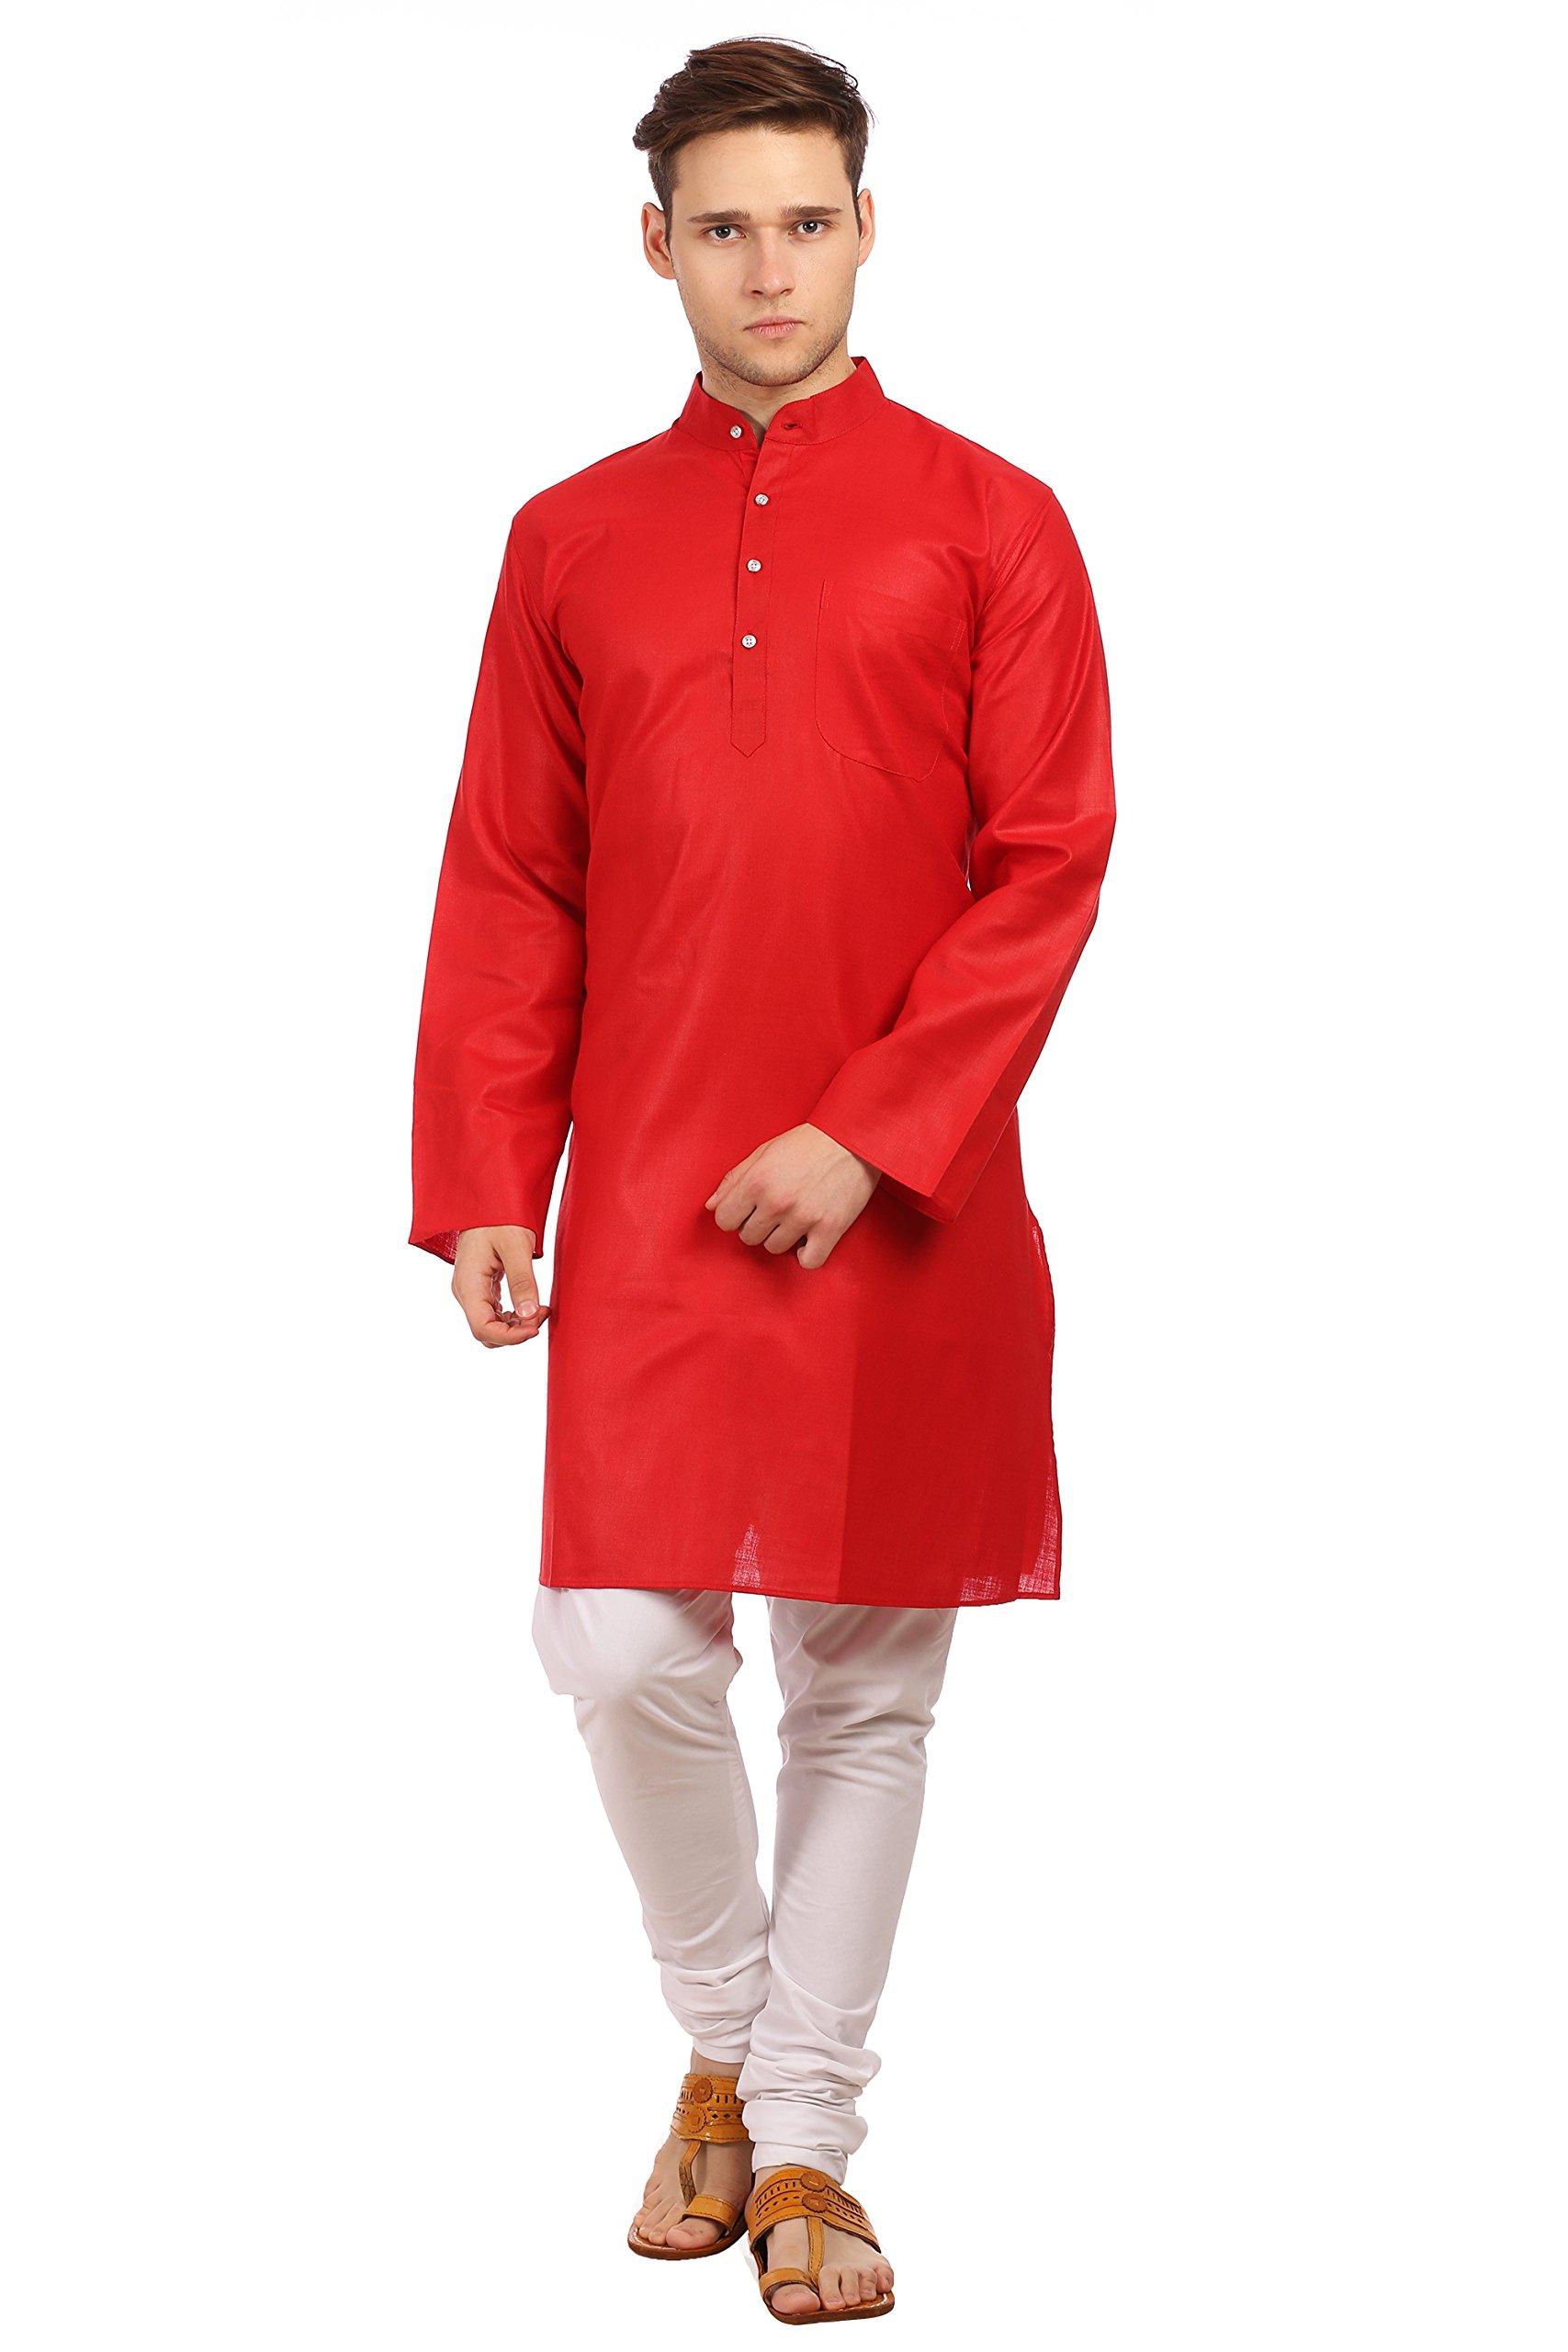 WINTAGE Men's Cotton Silk Festive and Casual Red Kurta Pyjama